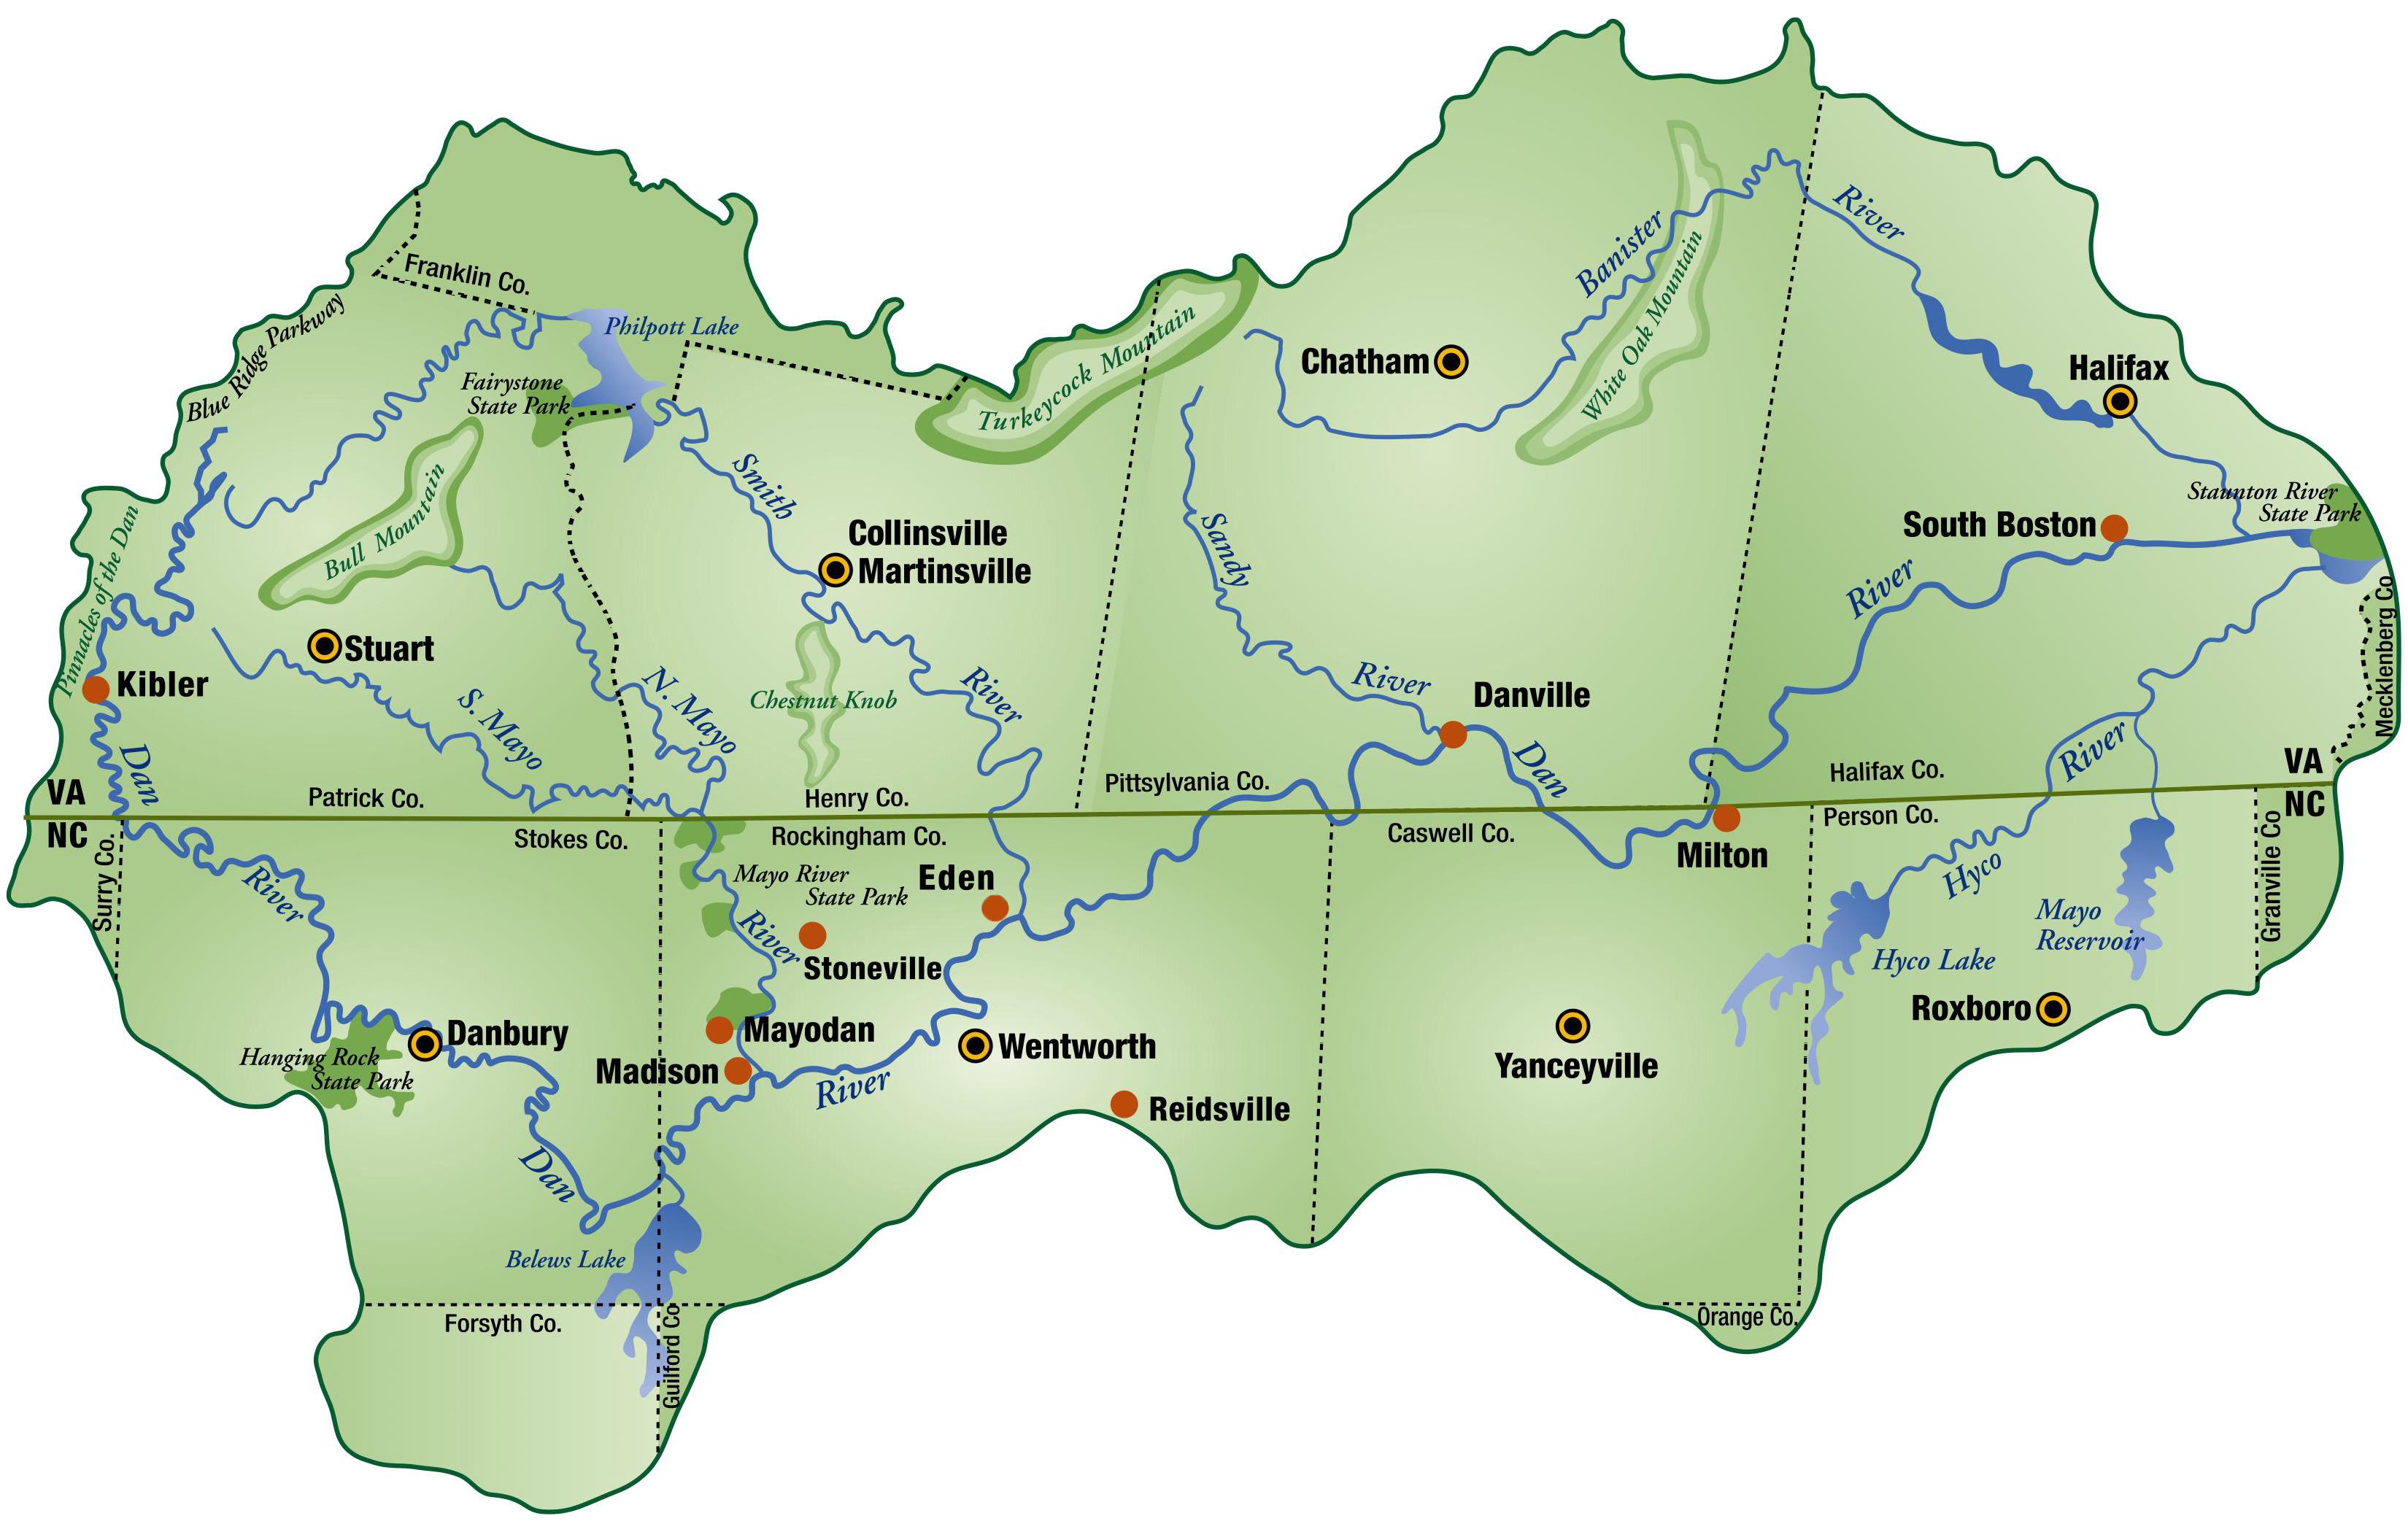 2019 DRBA Basin Map